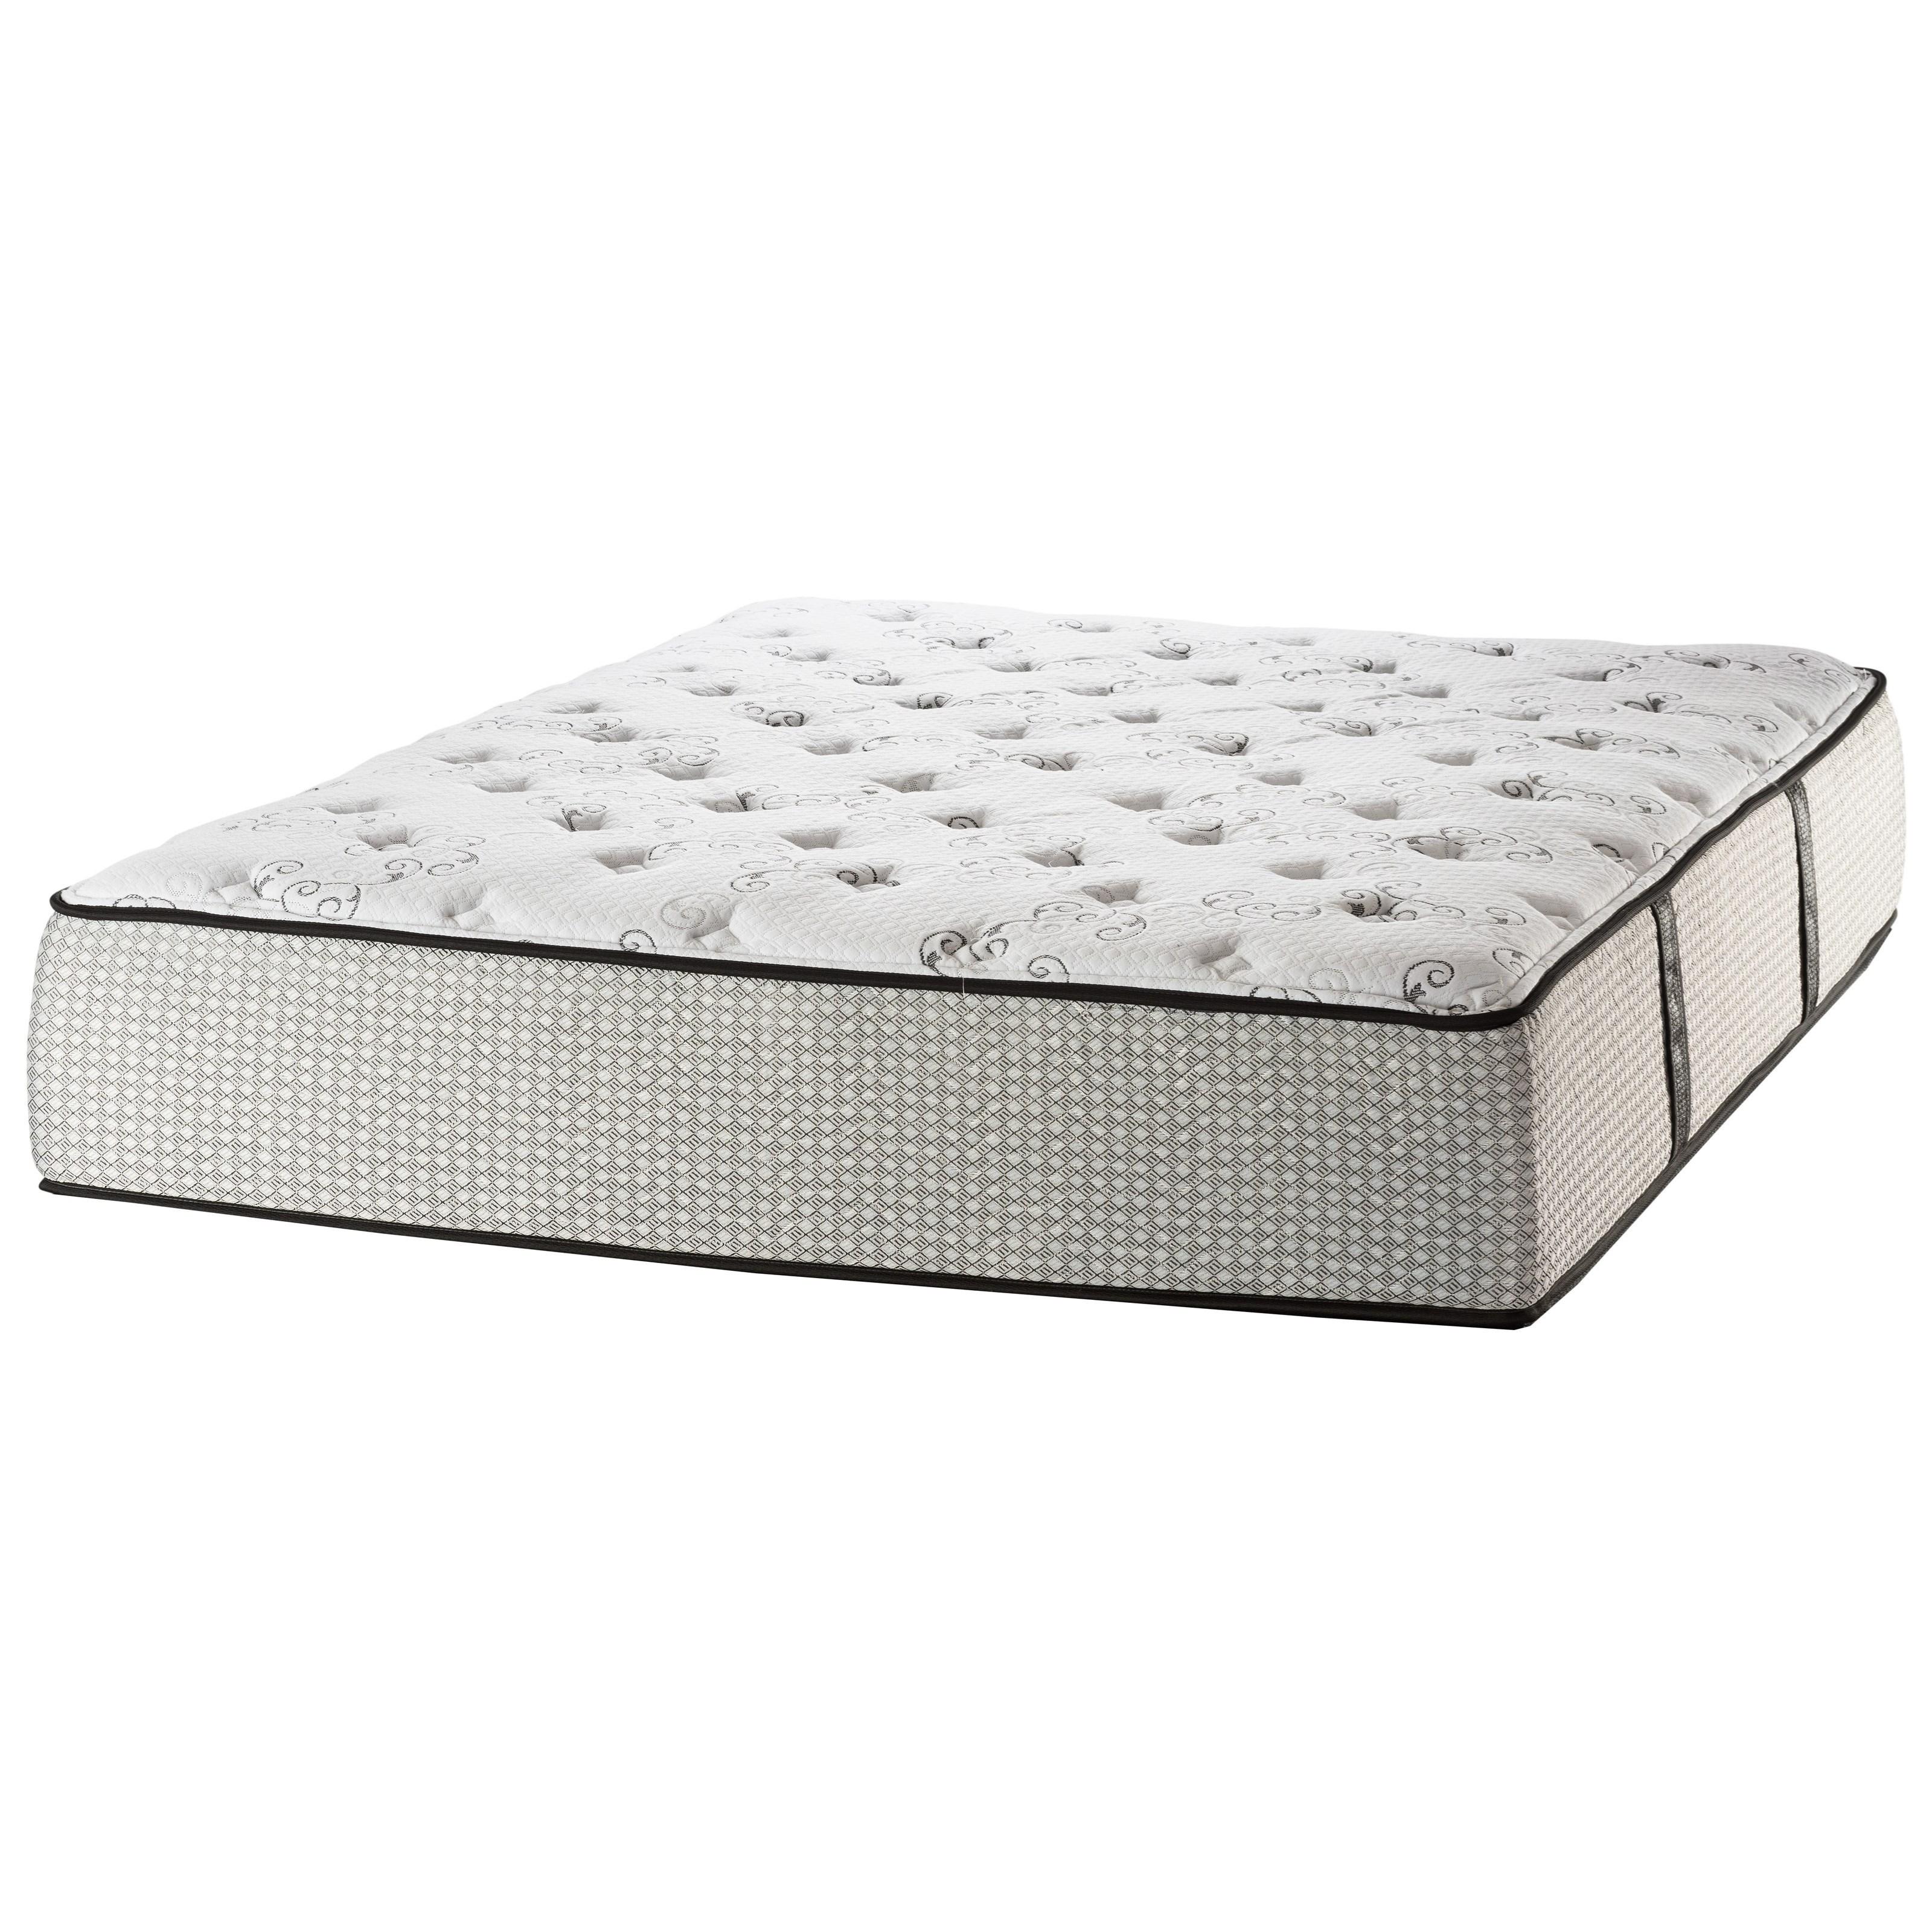 white dove mattress cambridge grand ave lux firm king luxury firm mattress